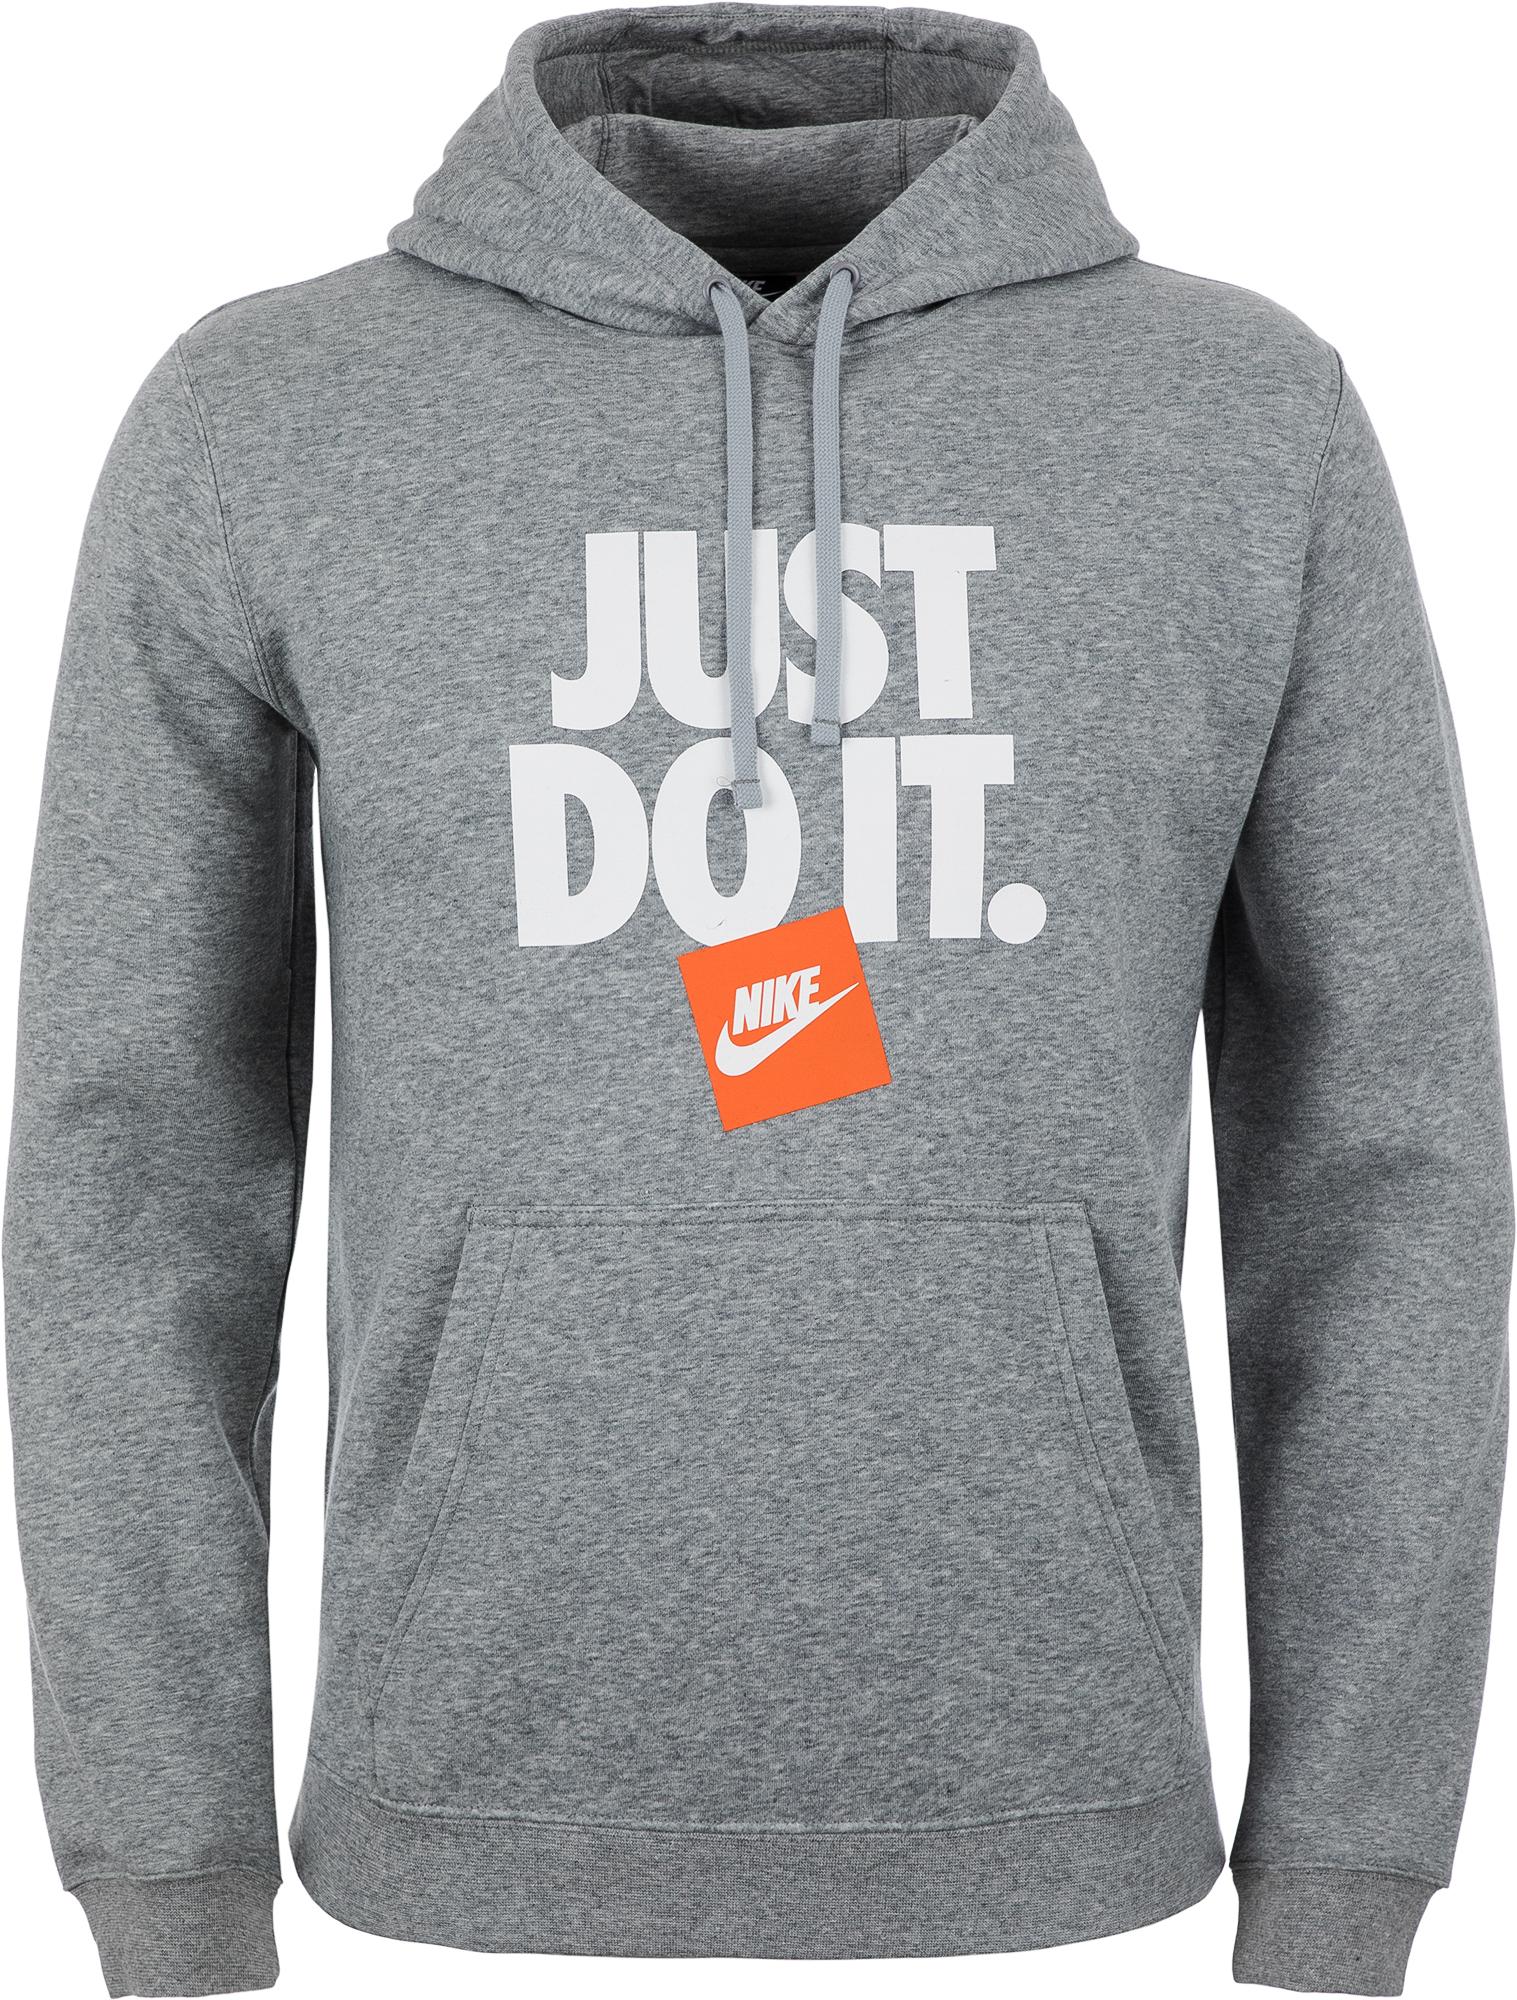 Nike Джемпер мужской Nike Sportswear, размер 52-54